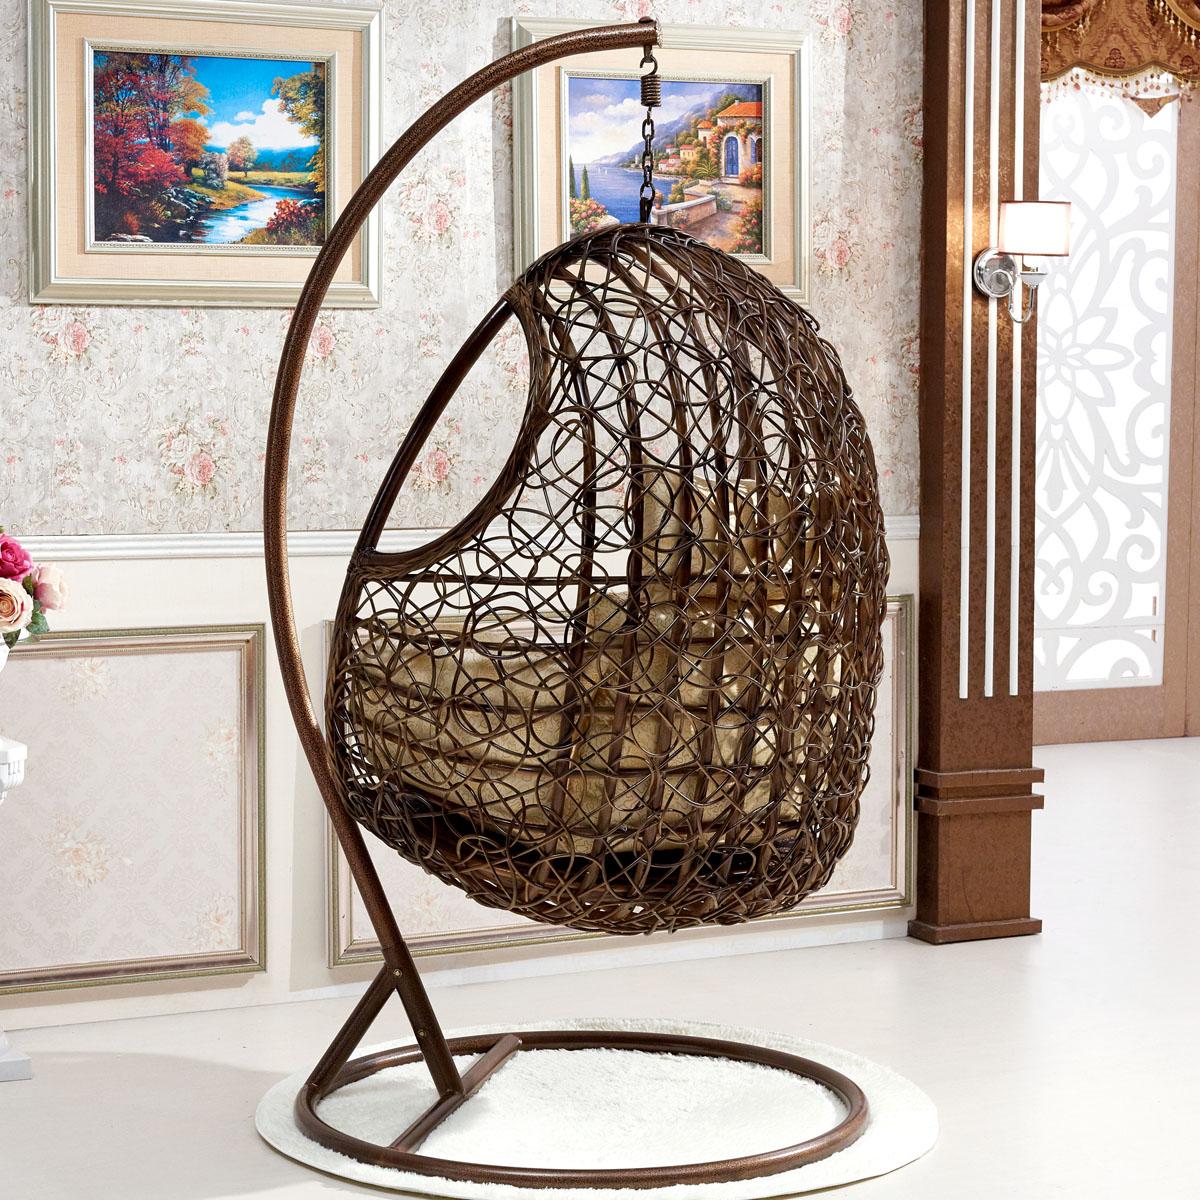 online kaufen gro handel innen schaukel f r erwachsene aus china innen schaukel f r erwachsene. Black Bedroom Furniture Sets. Home Design Ideas